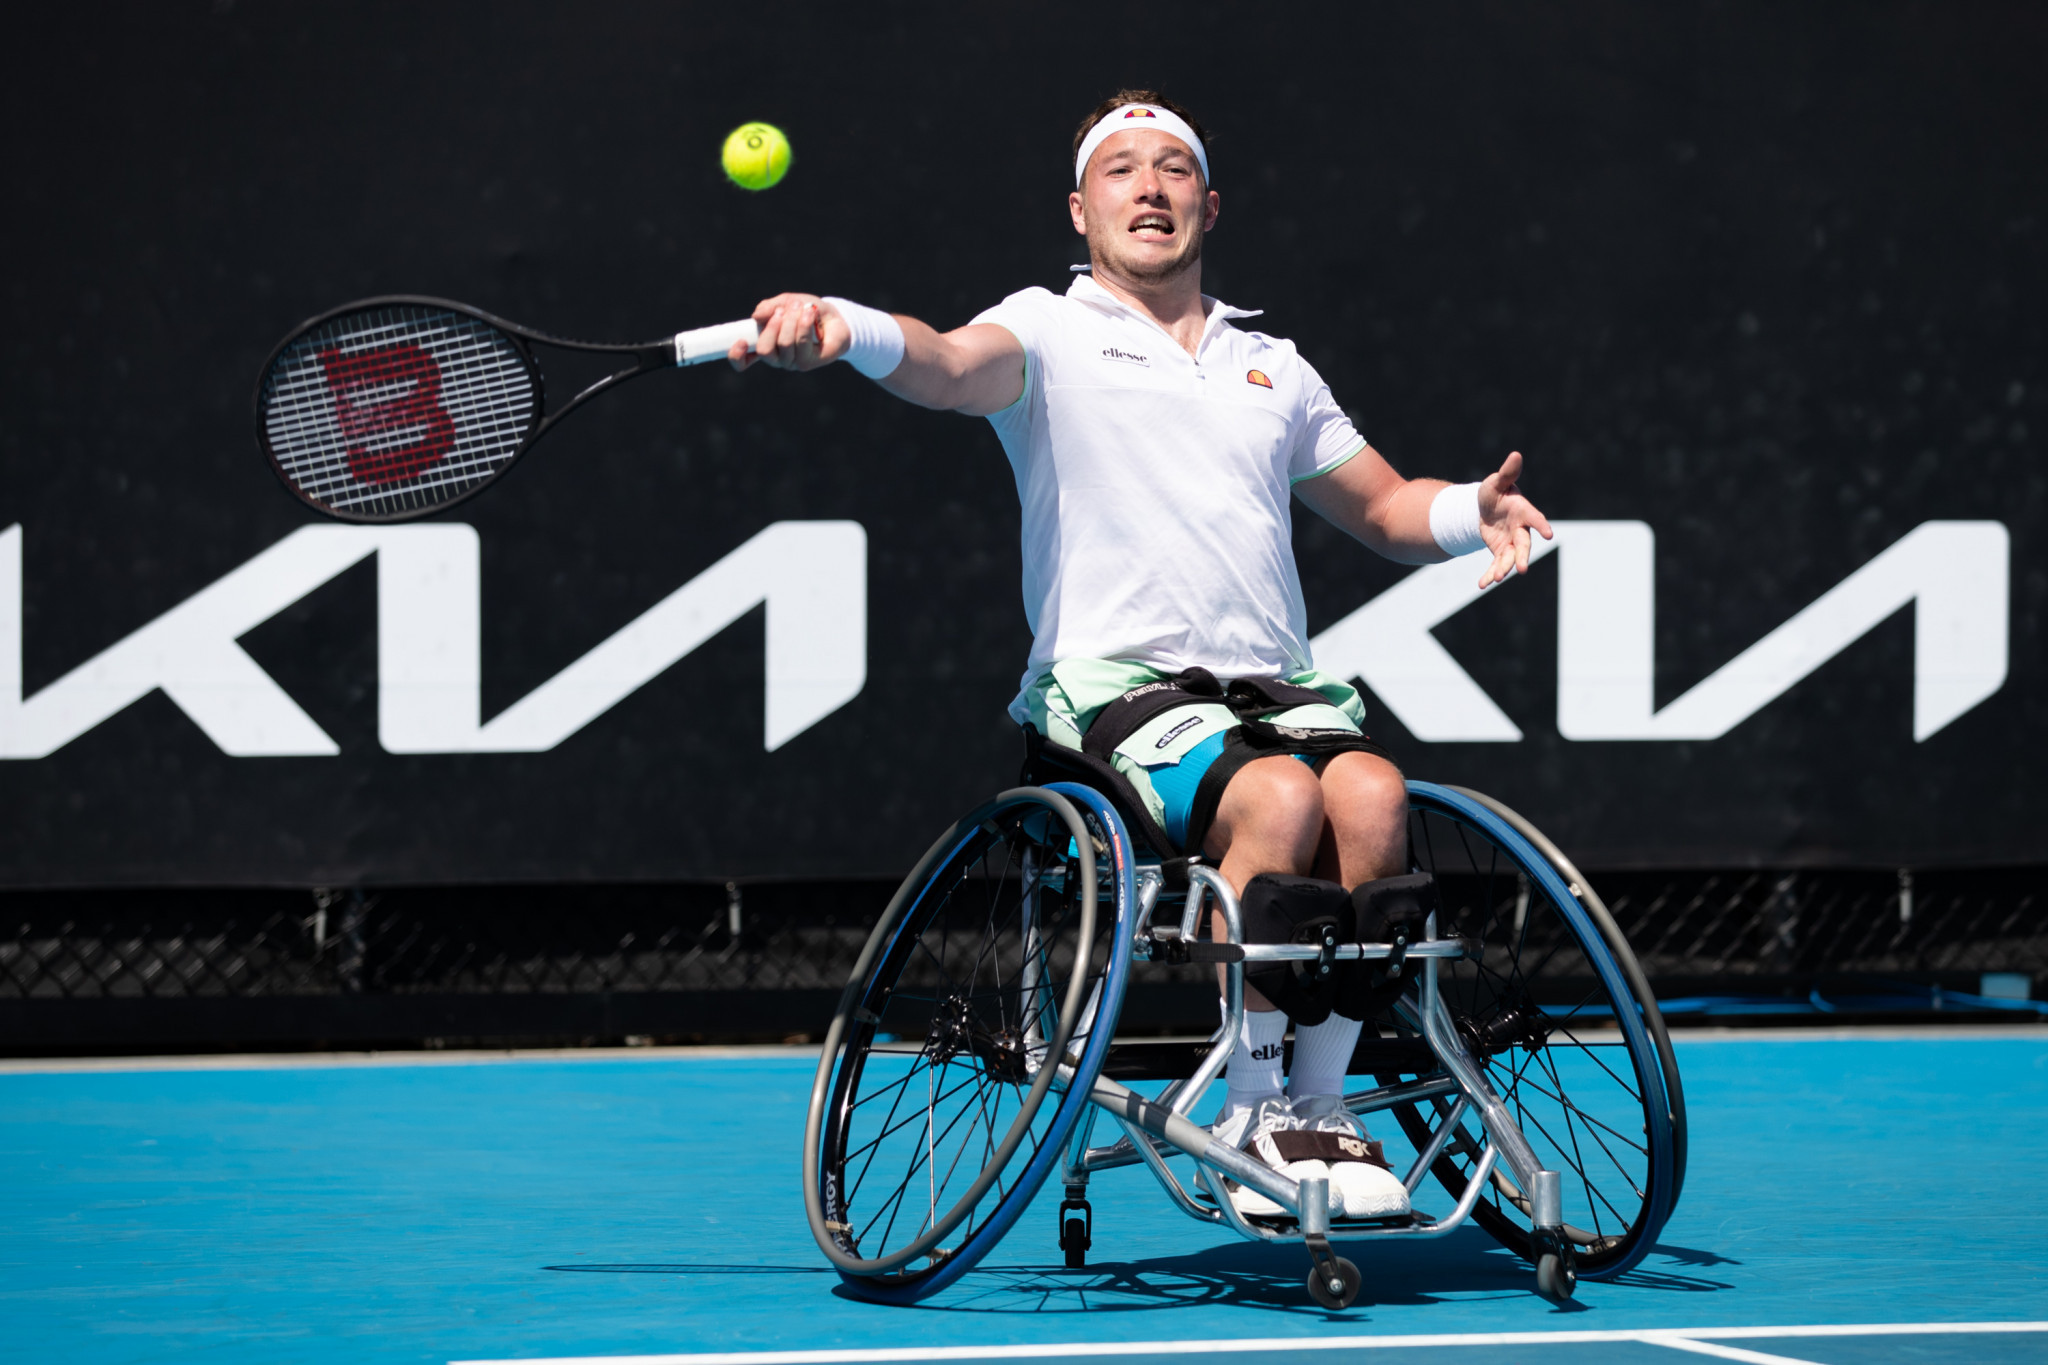 Britain's Alfie Hewett is through to a first Australian Open men's wheelchair singles final ©Getty Images